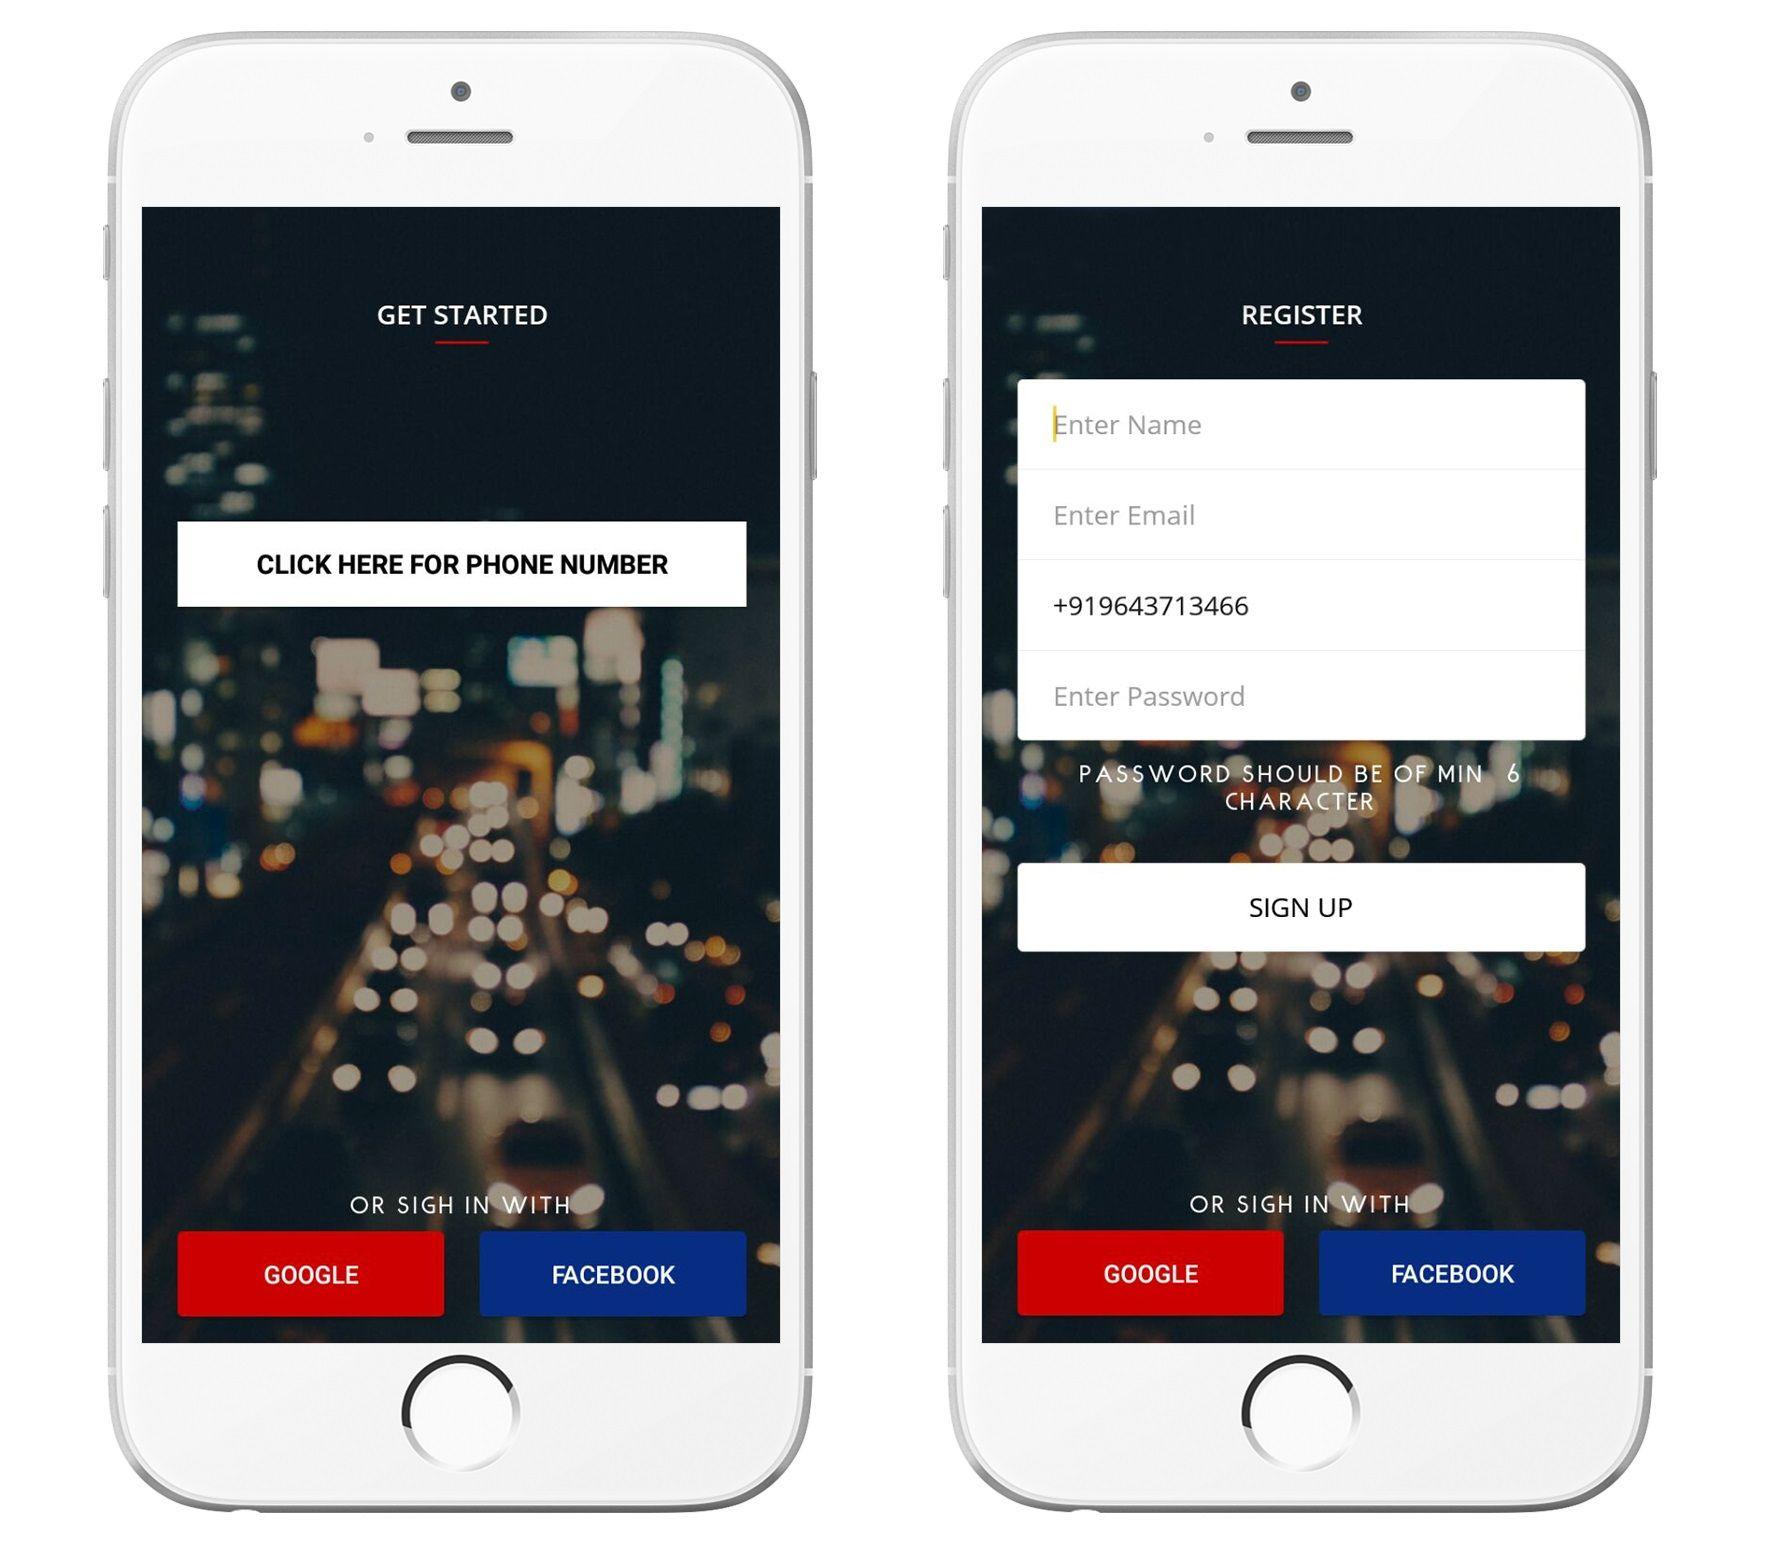 Apporio Taxi's Easy Login Options using Social Media Platforms